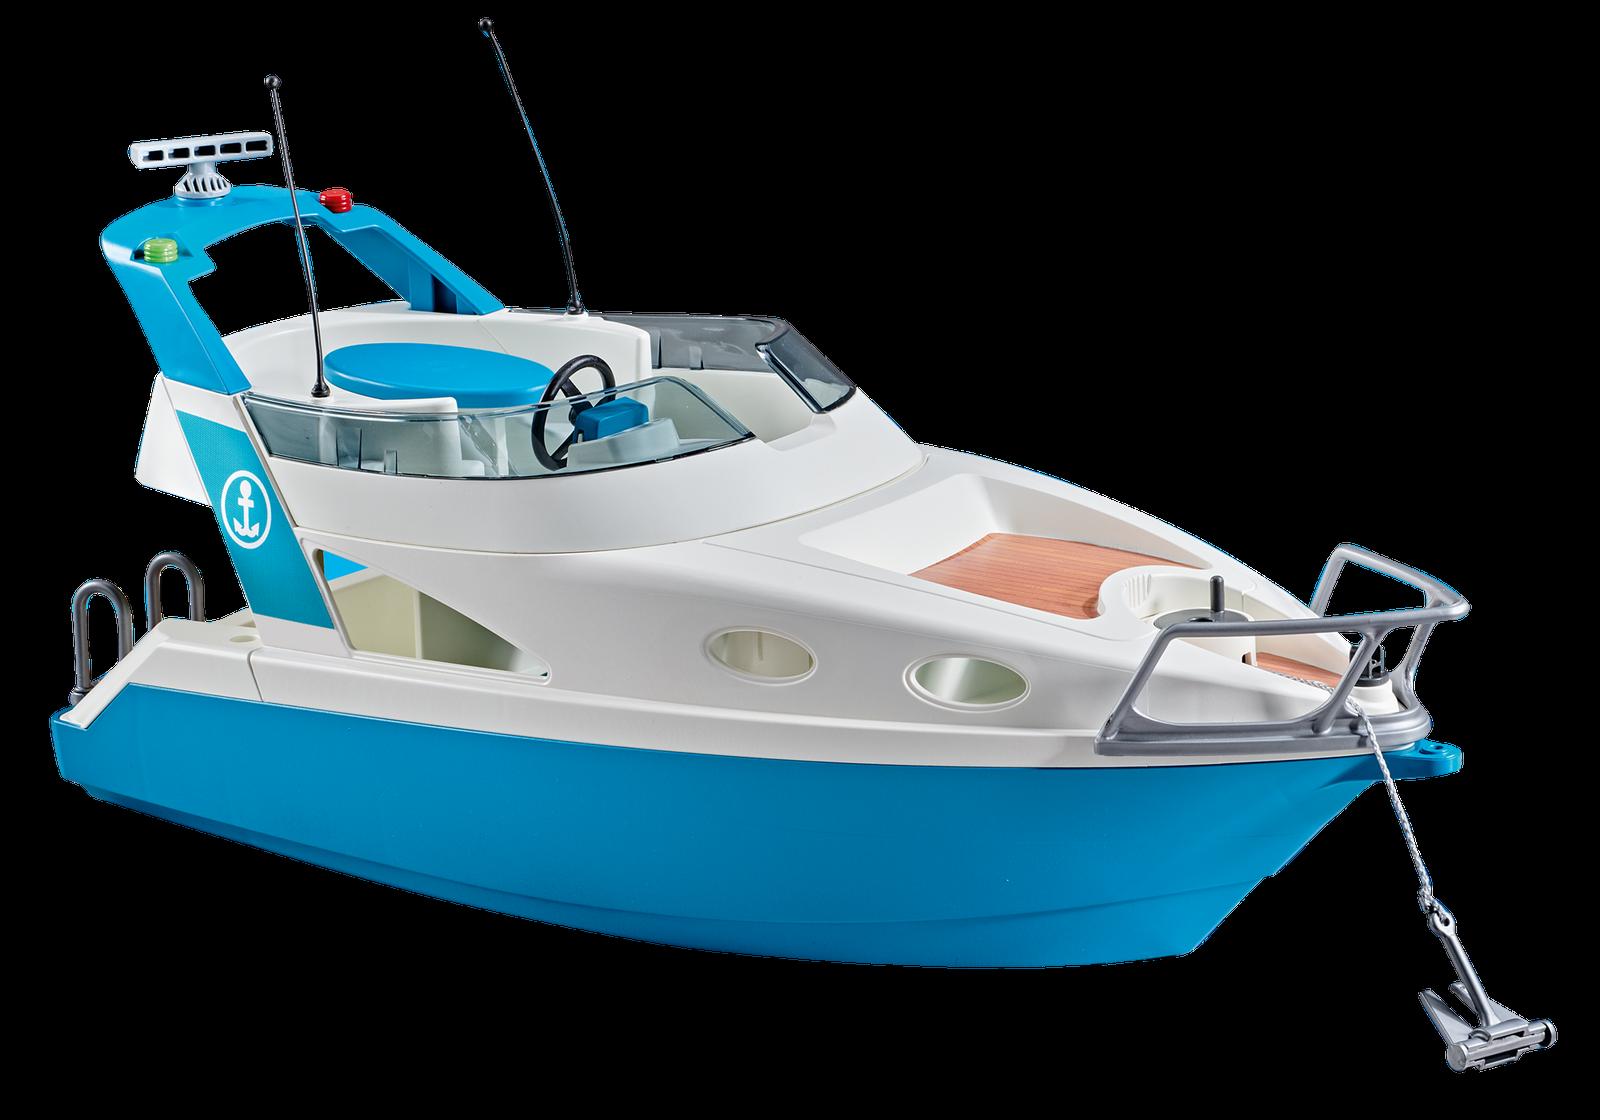 Playmobil - Summer Fun - 9822 - Luxusyacht - NEU OVP